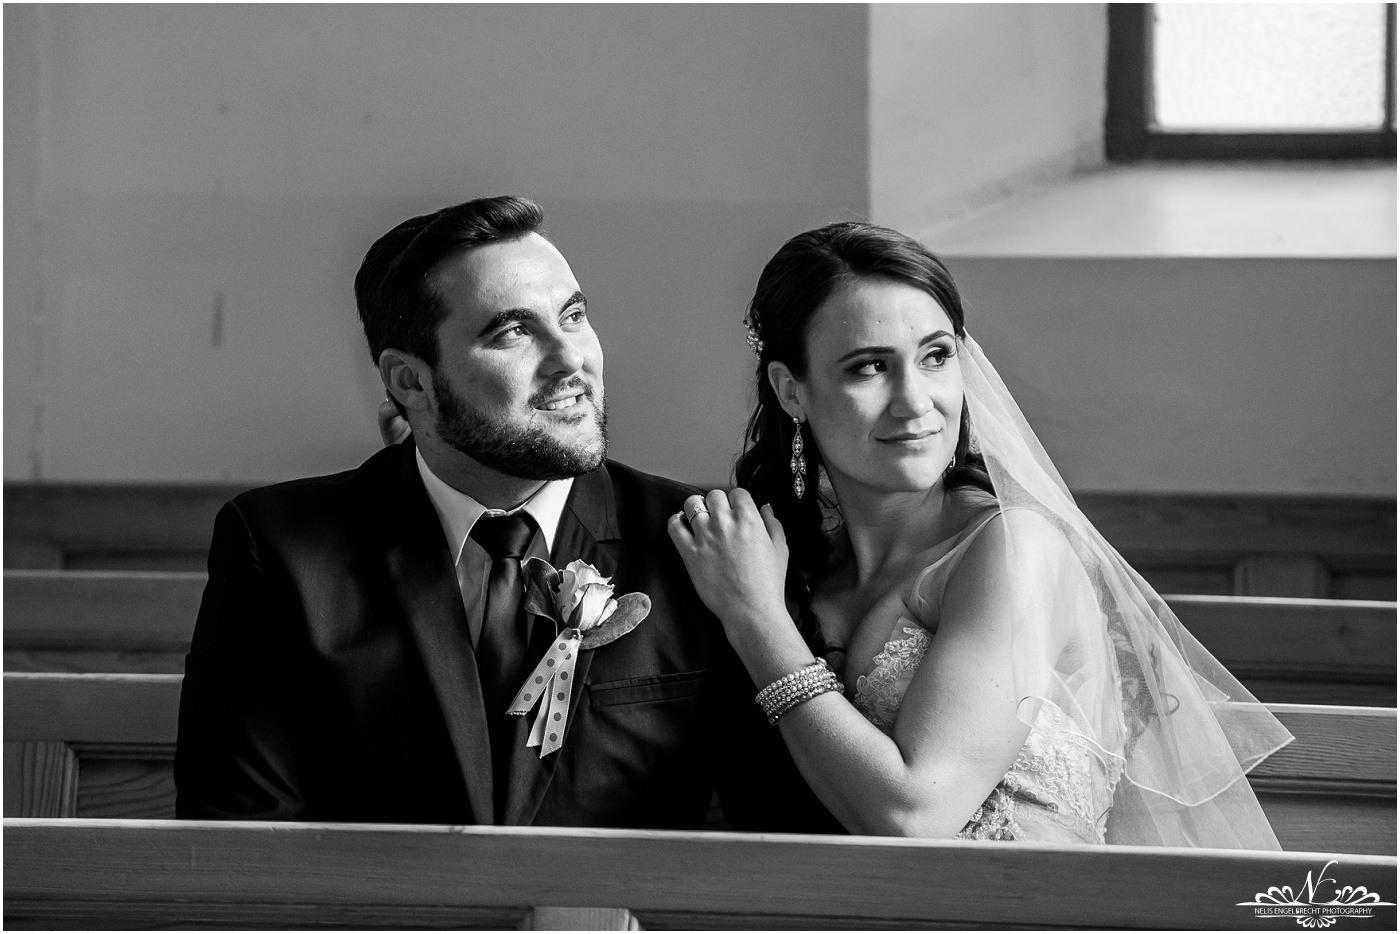 Eensgezind-Wedding-Photos-Nelis-Engelbrecht-Photography-072